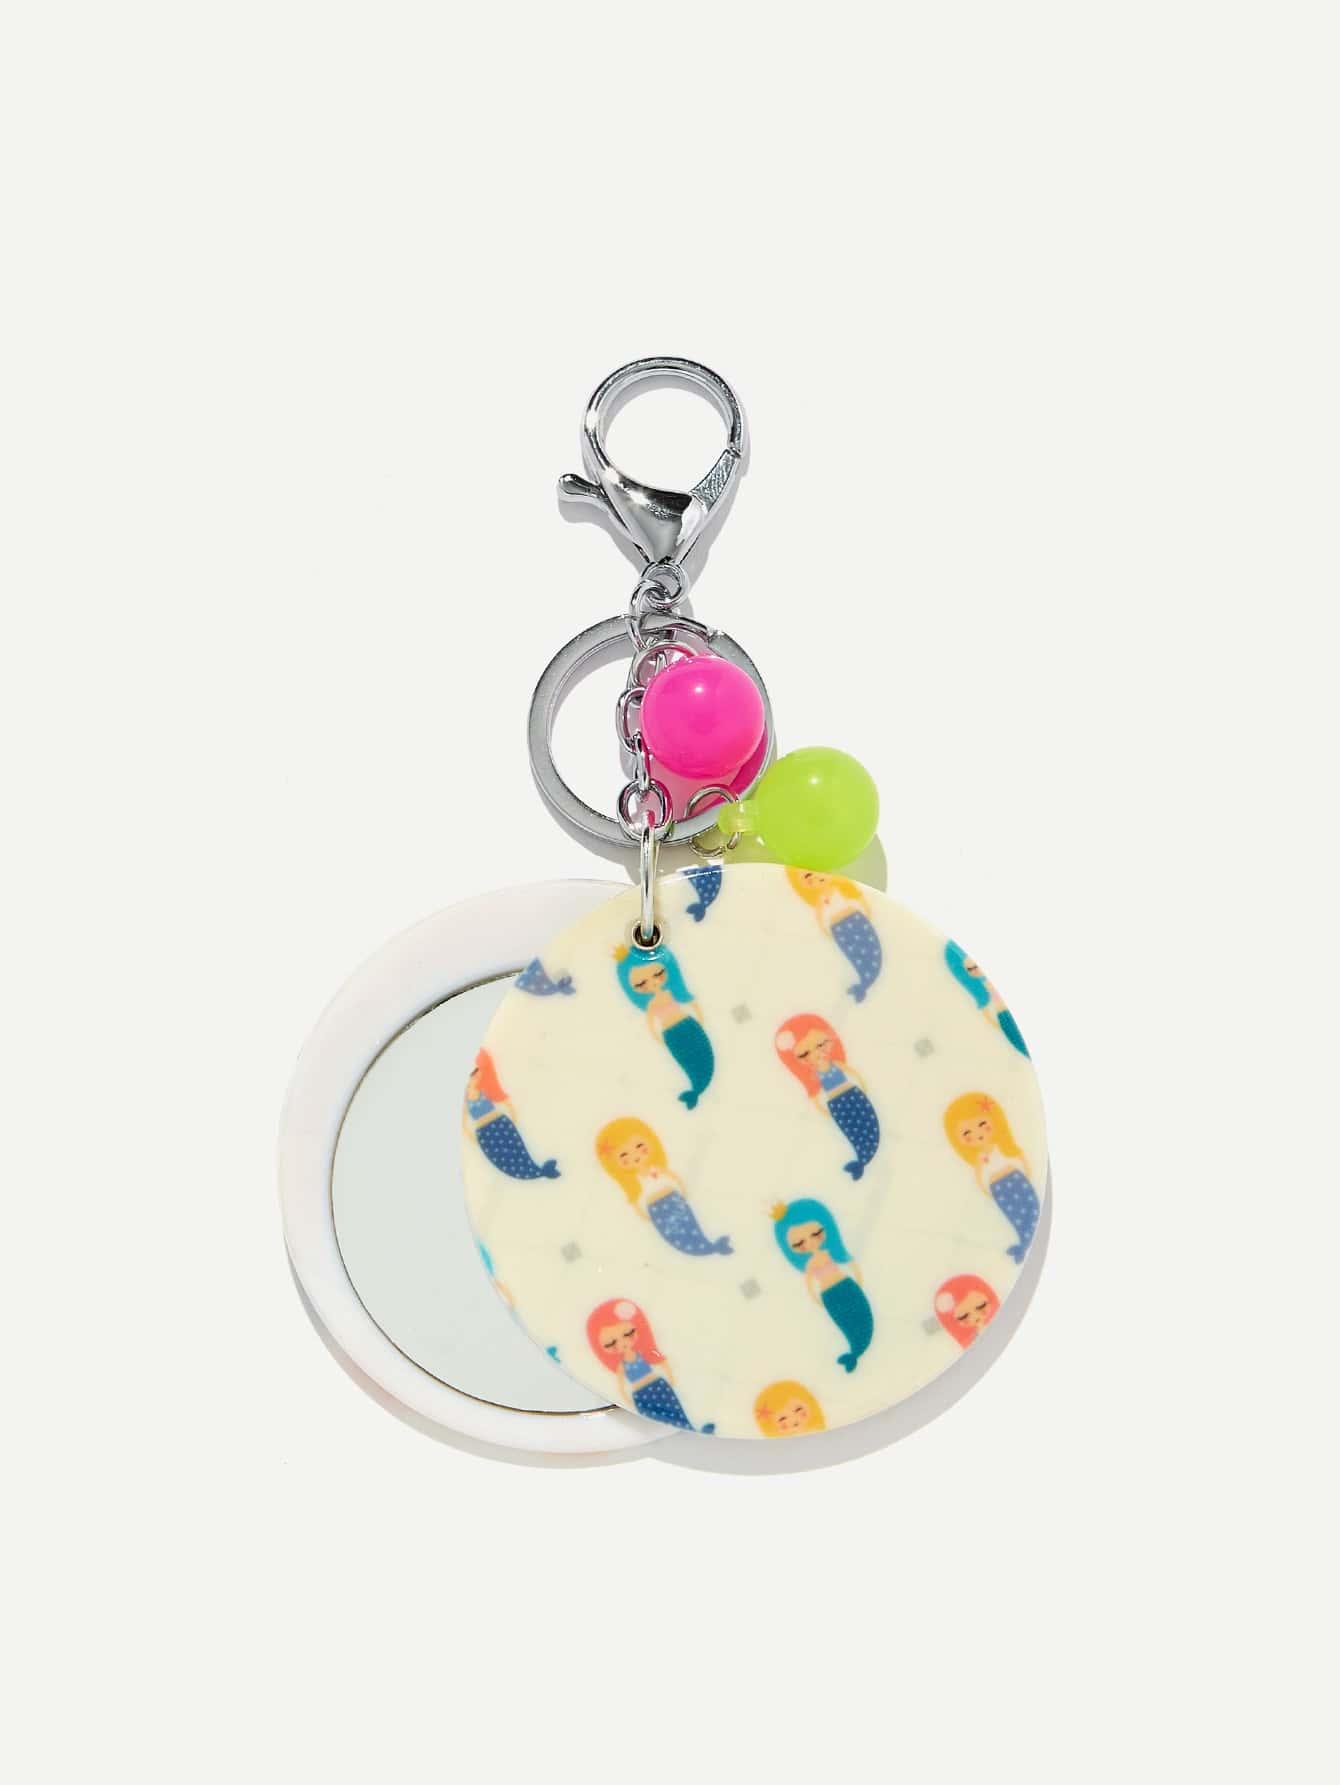 Random Color Ball Cartoon Mermaid Keychain